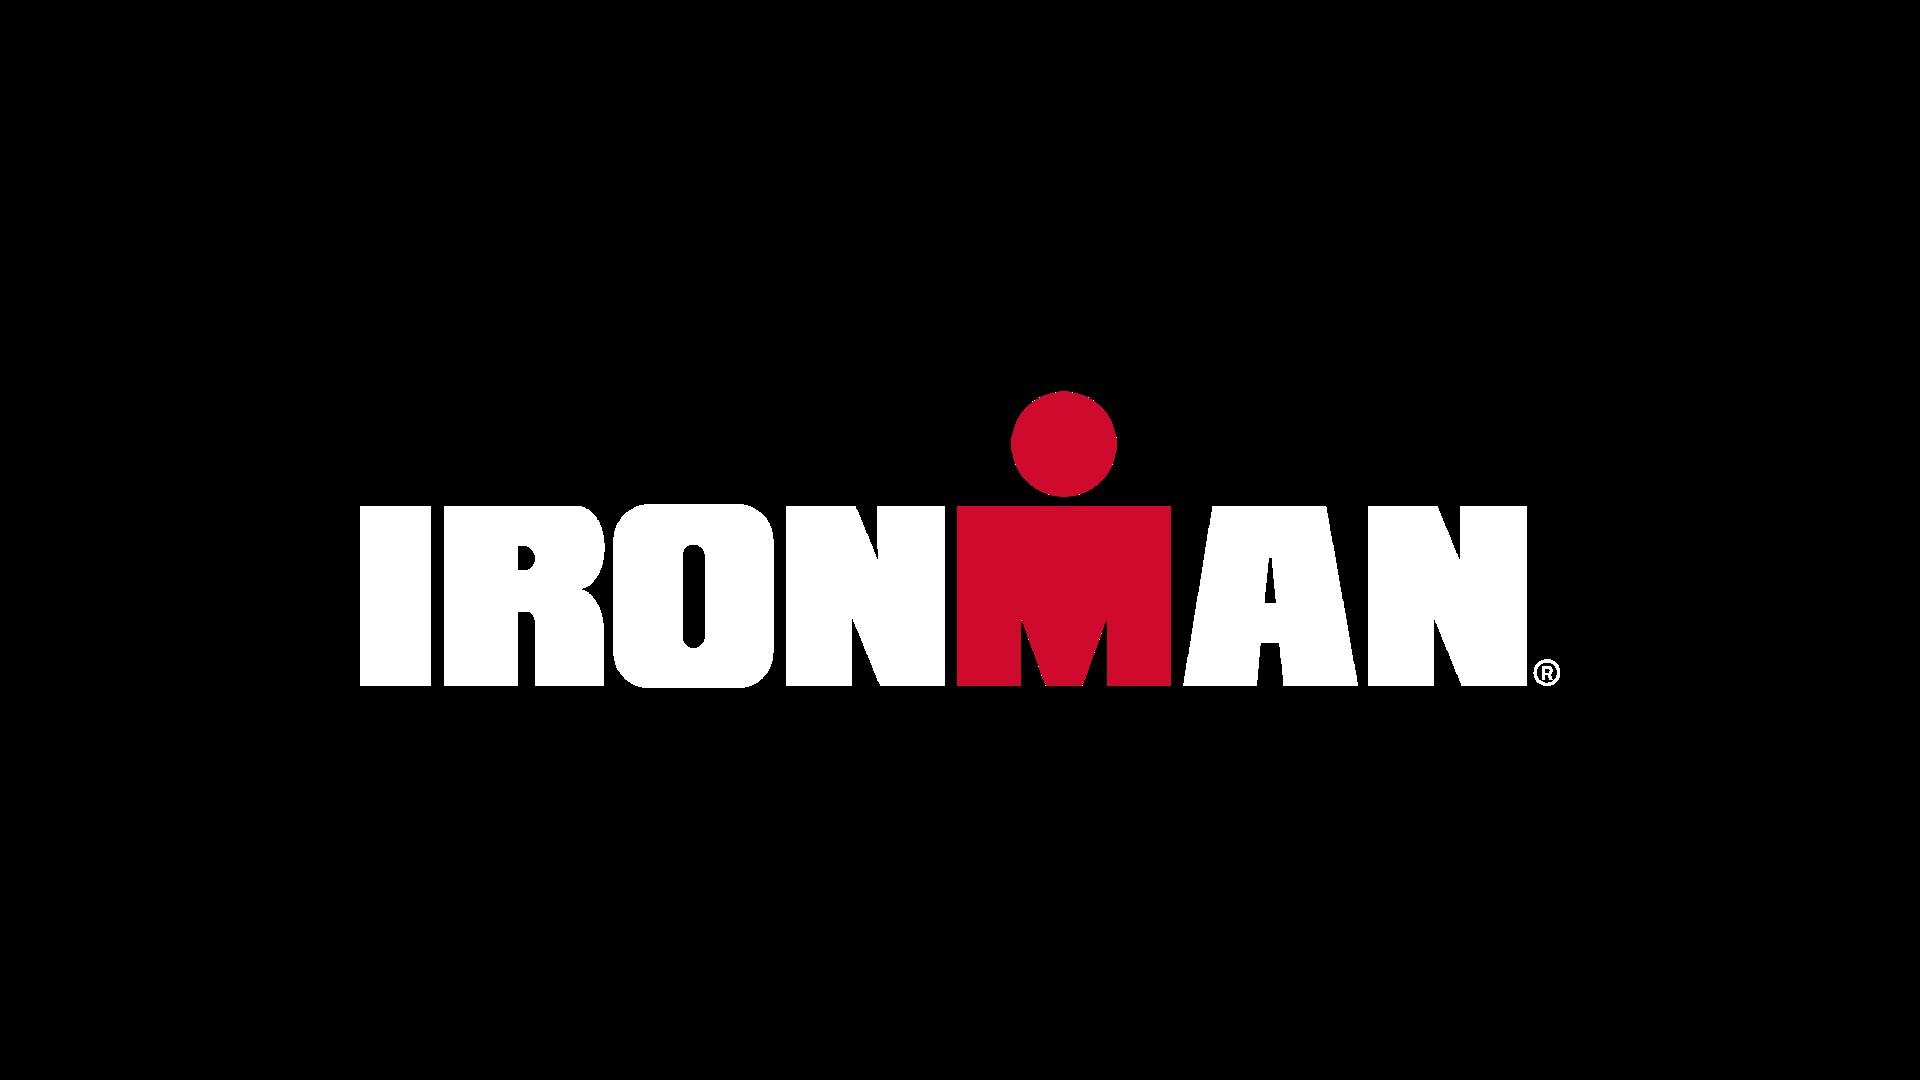 Triathlon – Ironman logo